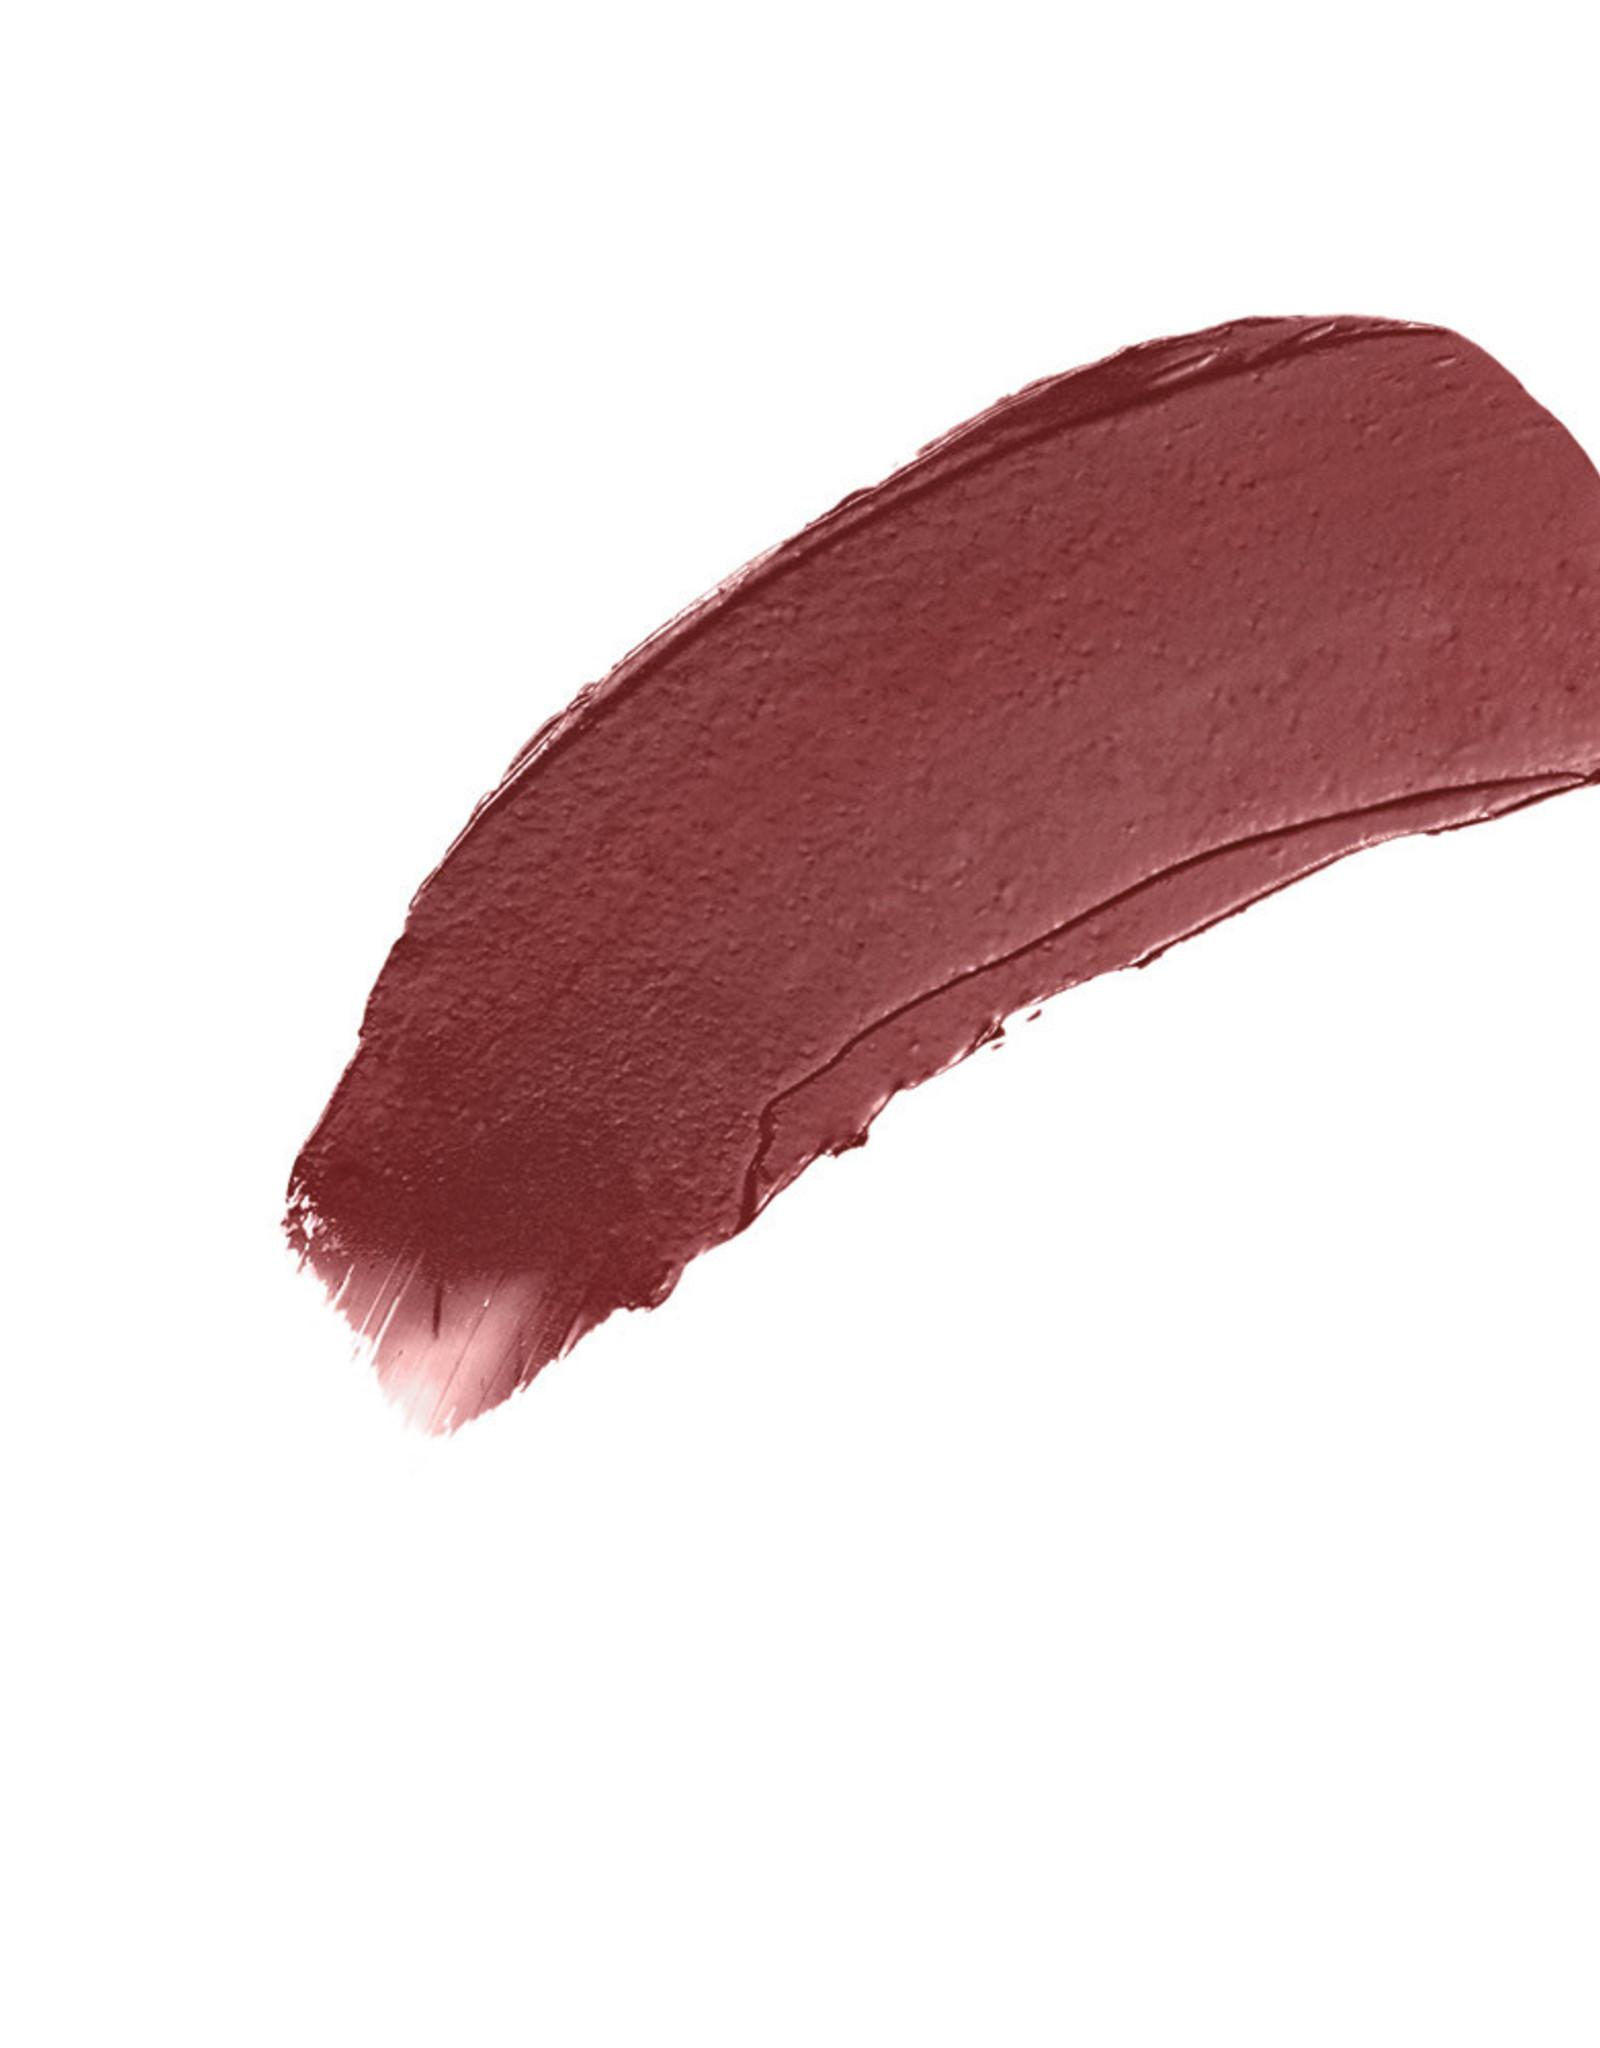 Triple luxe lipstick jamie